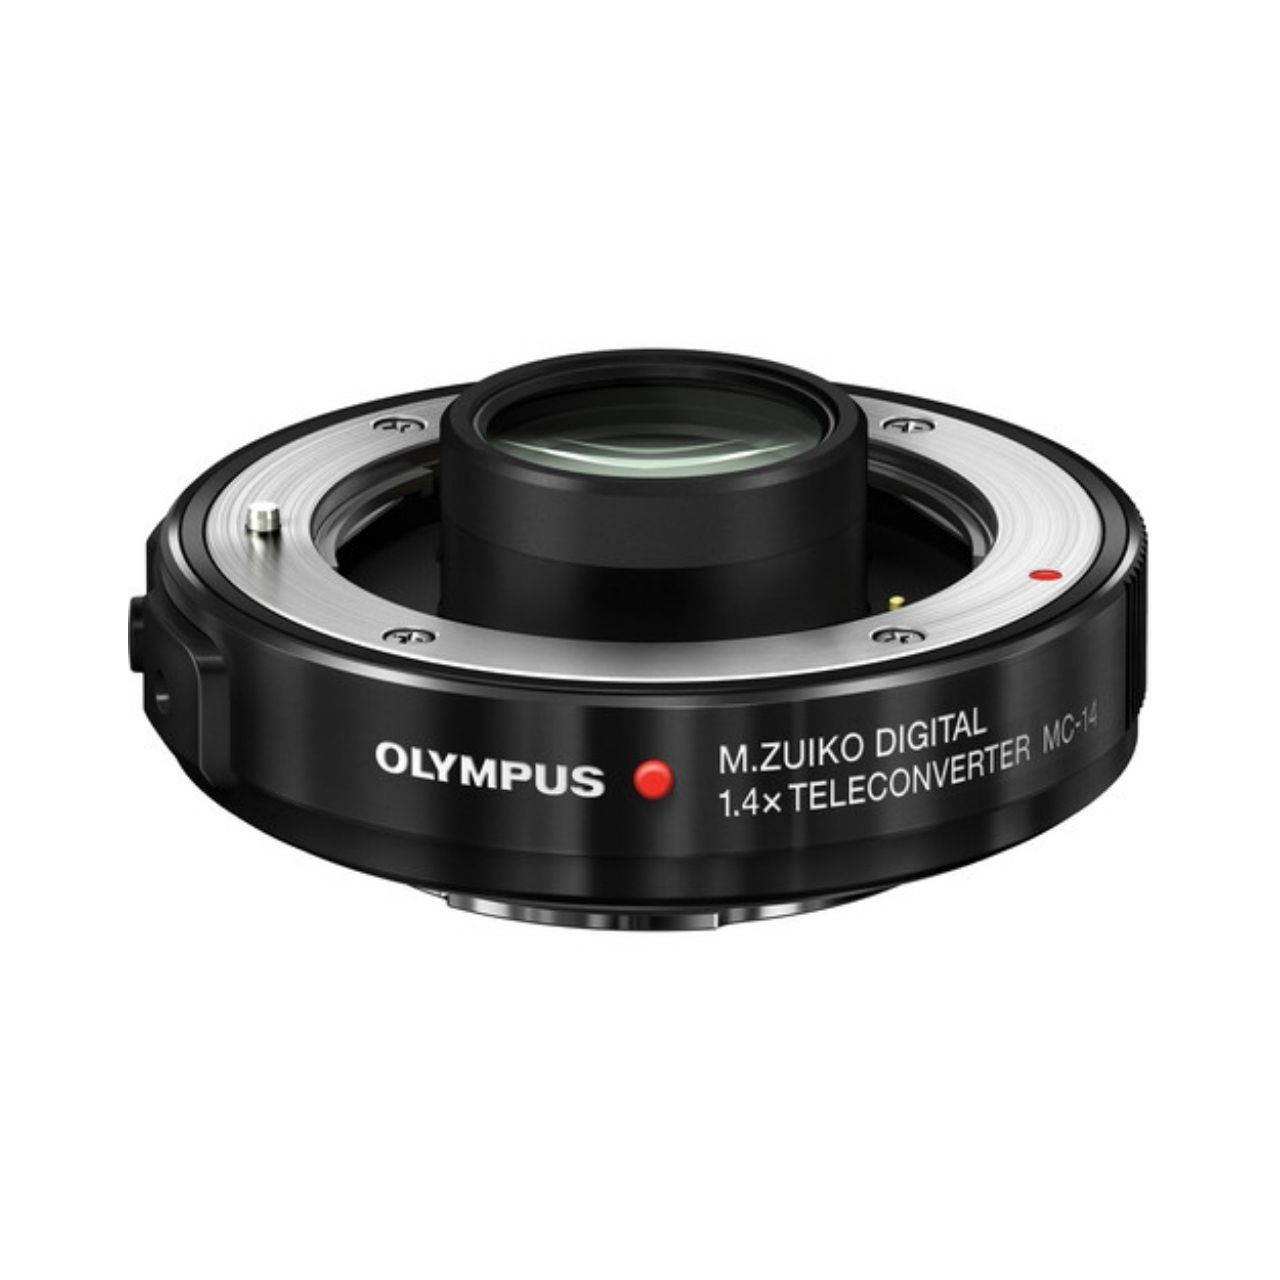 Olympus M.Zuiko MC-14 Teleconvertidor Objetivo  digital 1.4x